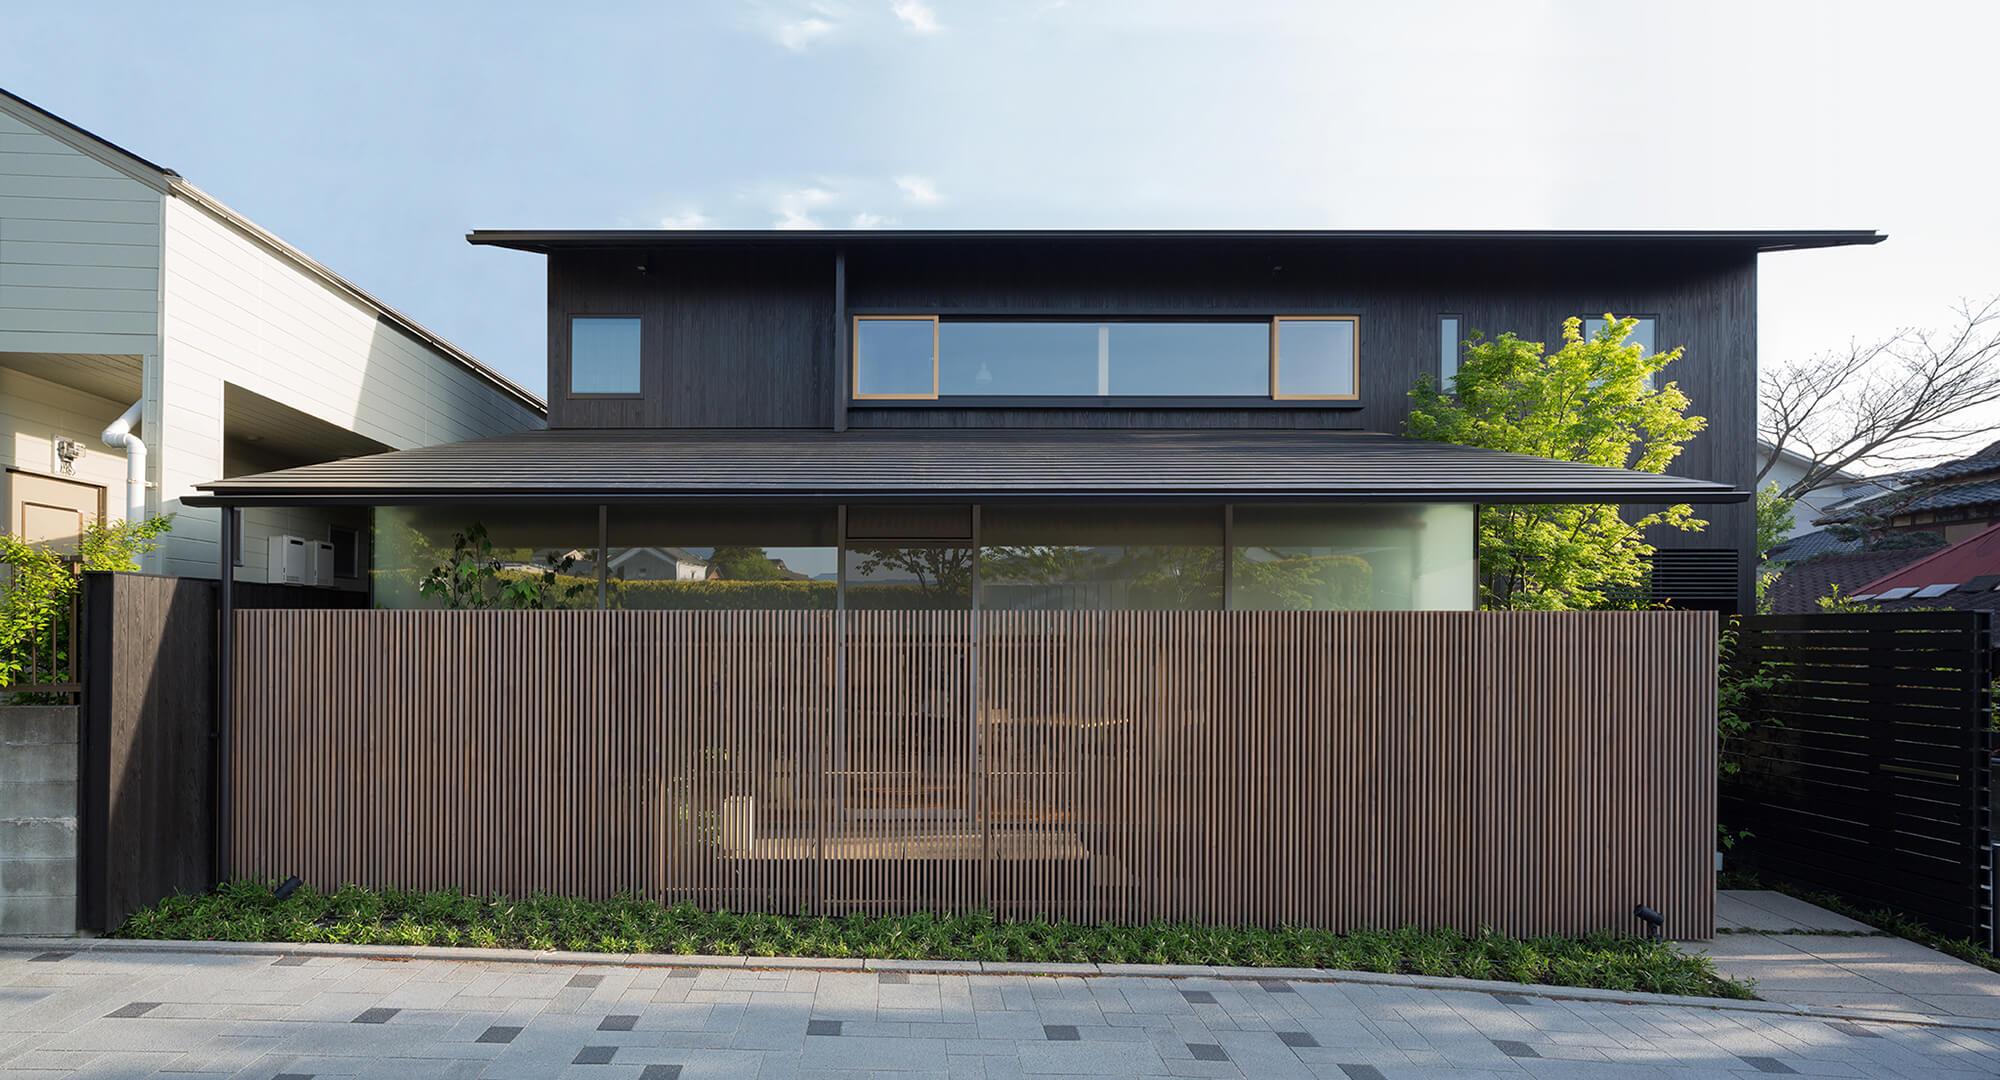 『koto house』-福岡県太宰府市-建築写真・竣工写真・インテリア写真3